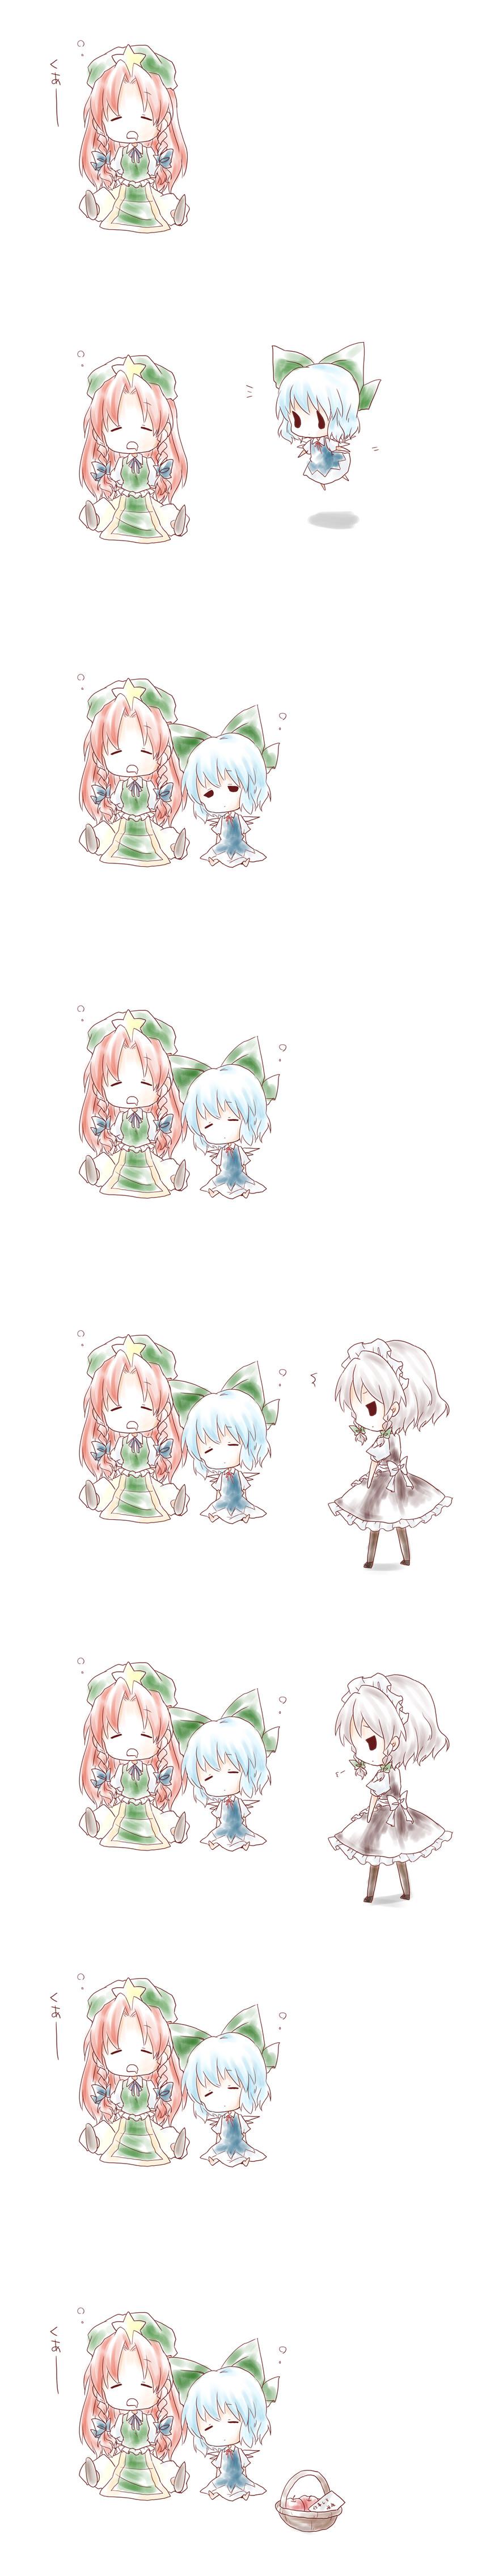 cirno, hong meiling, and izayoi sakuya (touhou) drawn by kuromame (8gou)